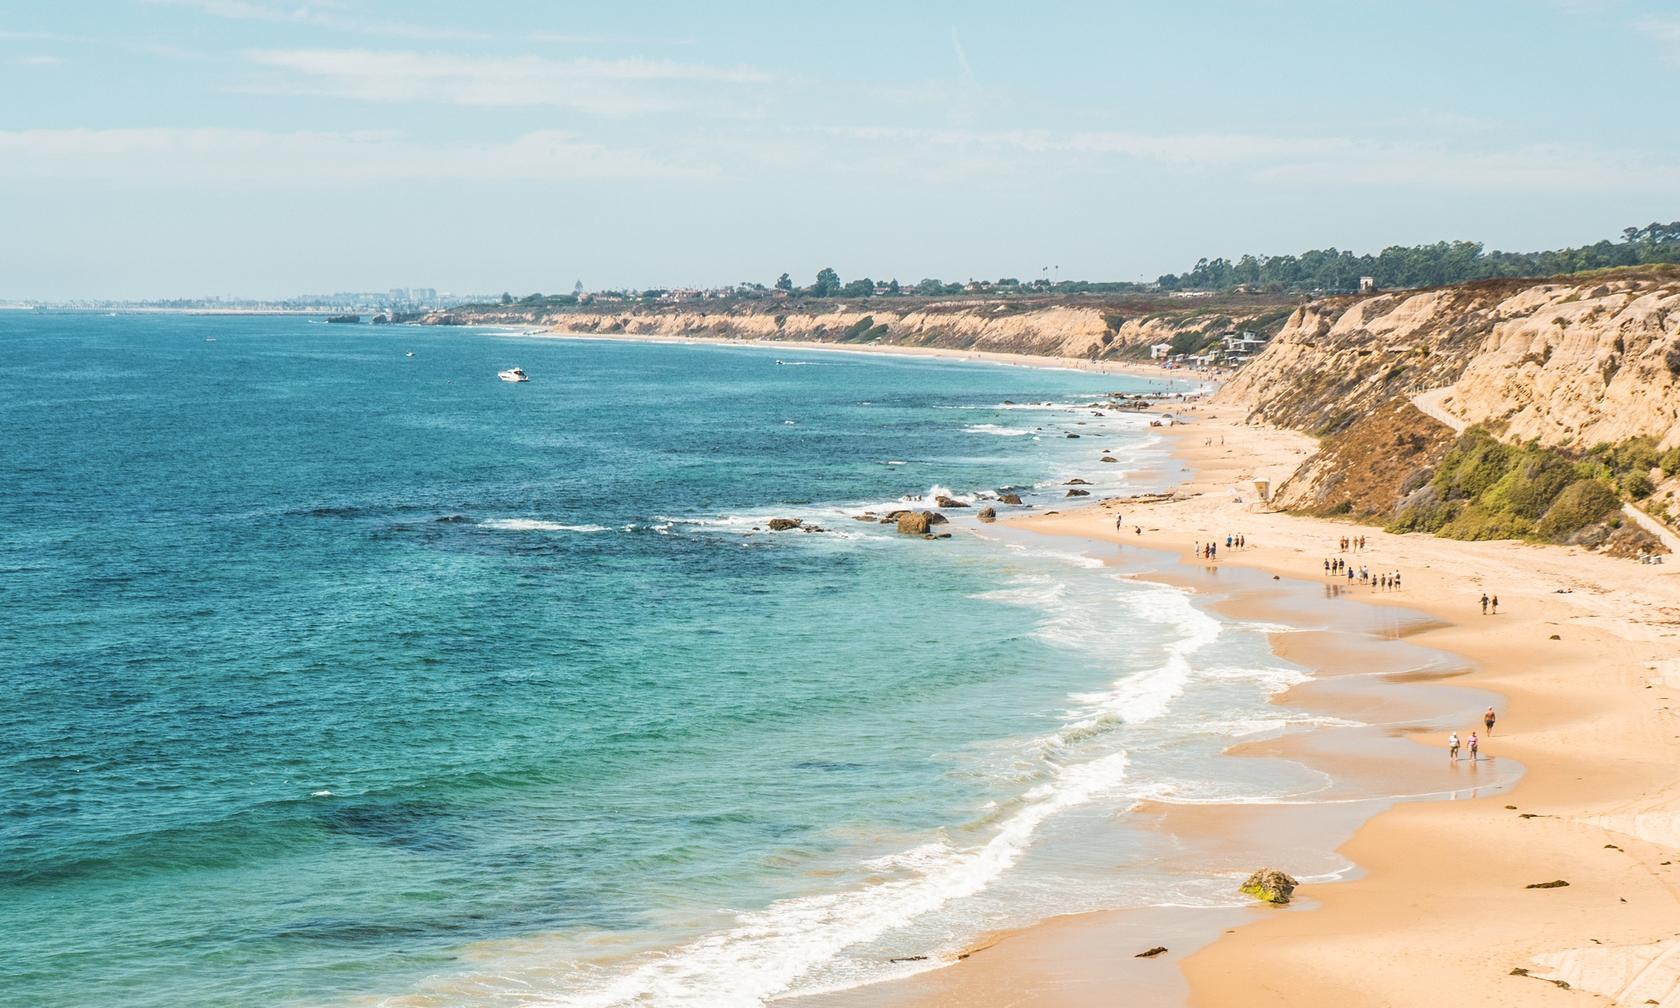 Vacation rentals in Huntington Beach